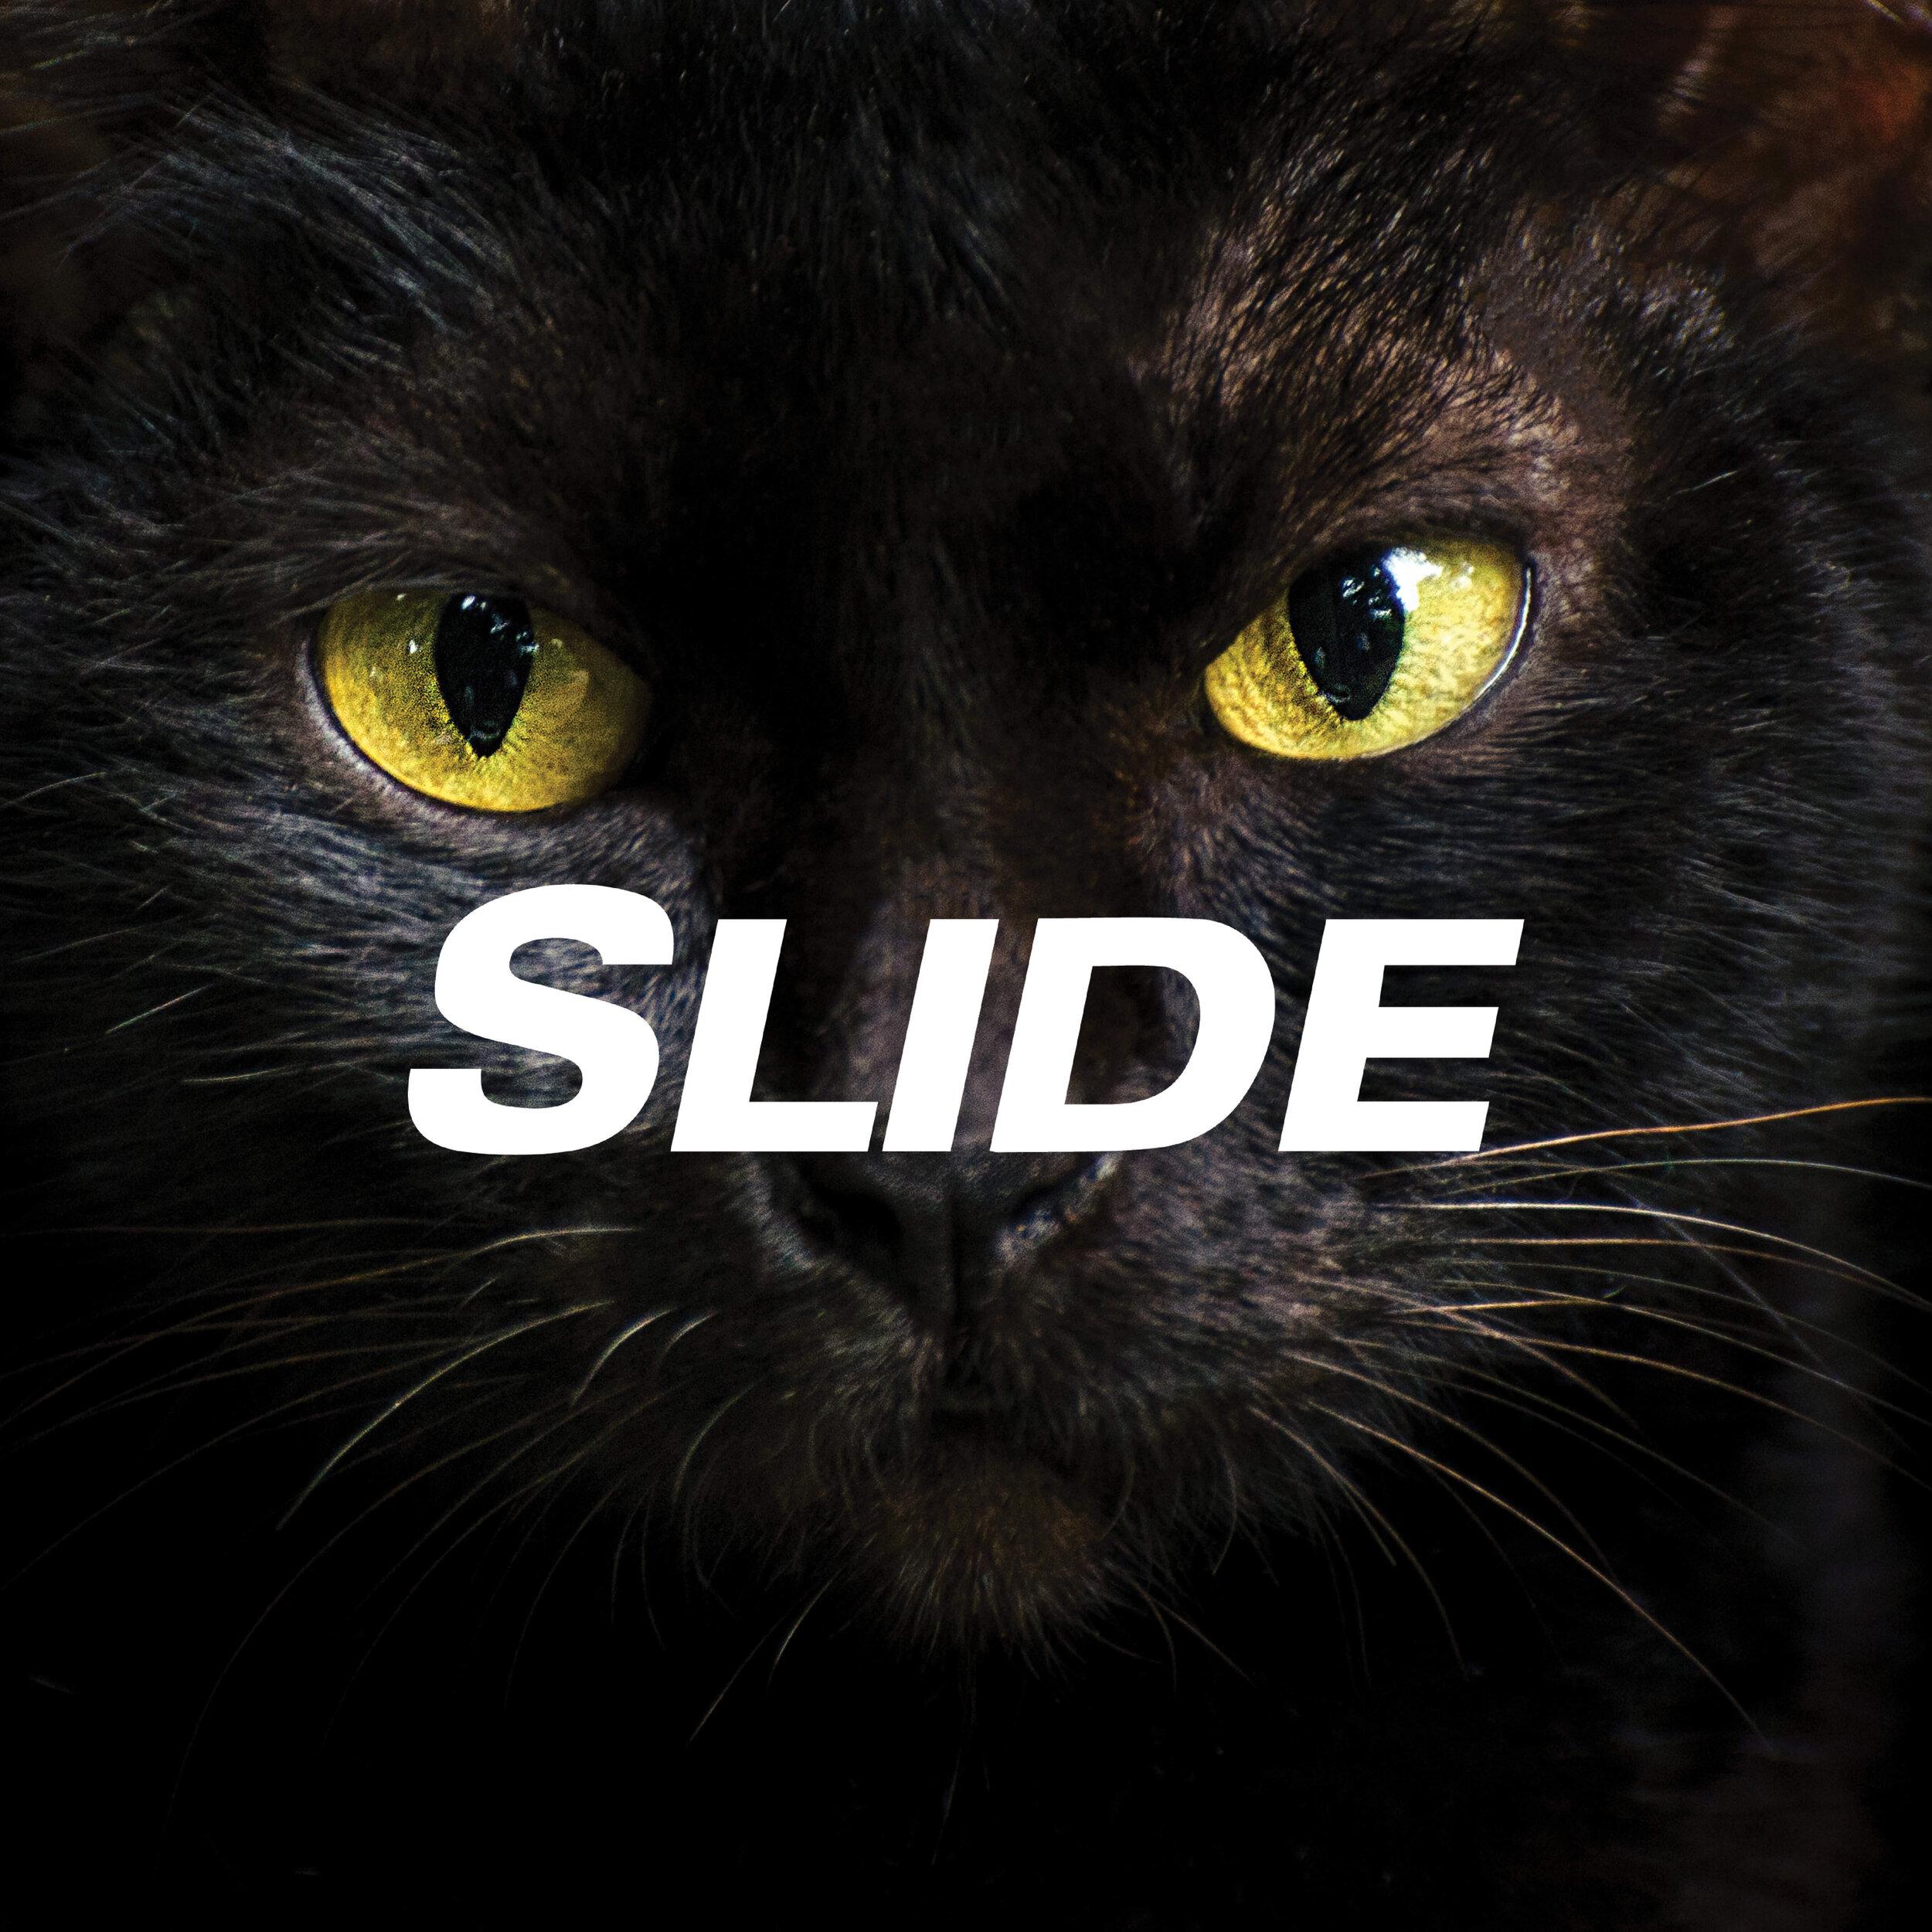 Slide_Arm & Hammer_credential.jpg